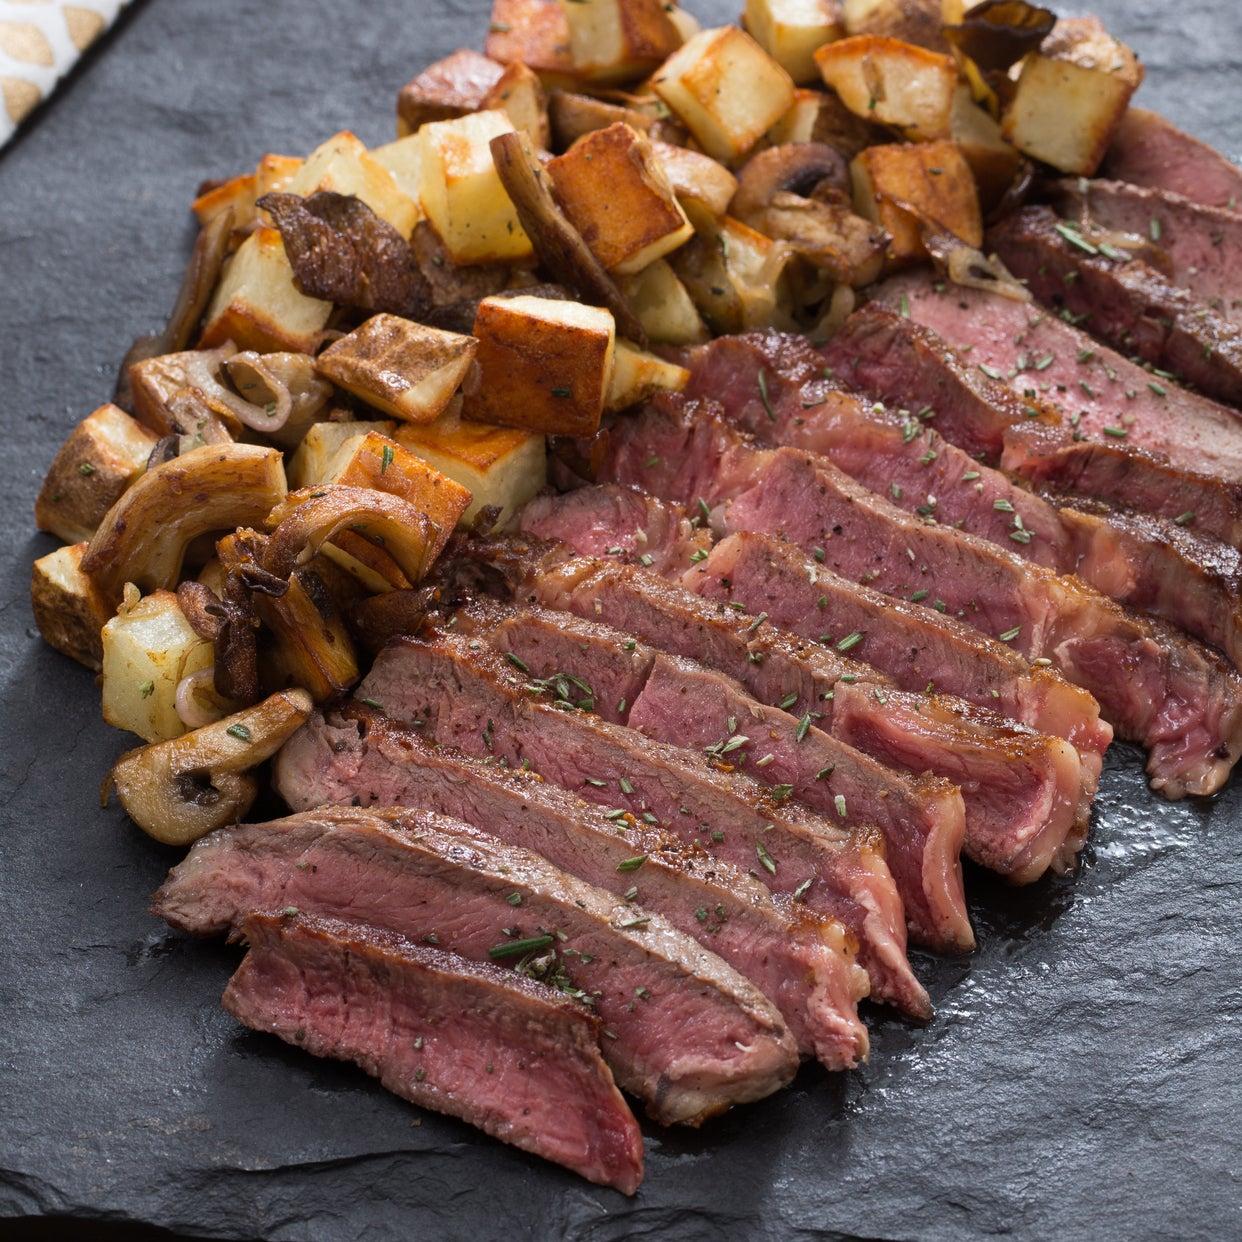 Ribeye Steak for Two with Mushroom & Potato Hash